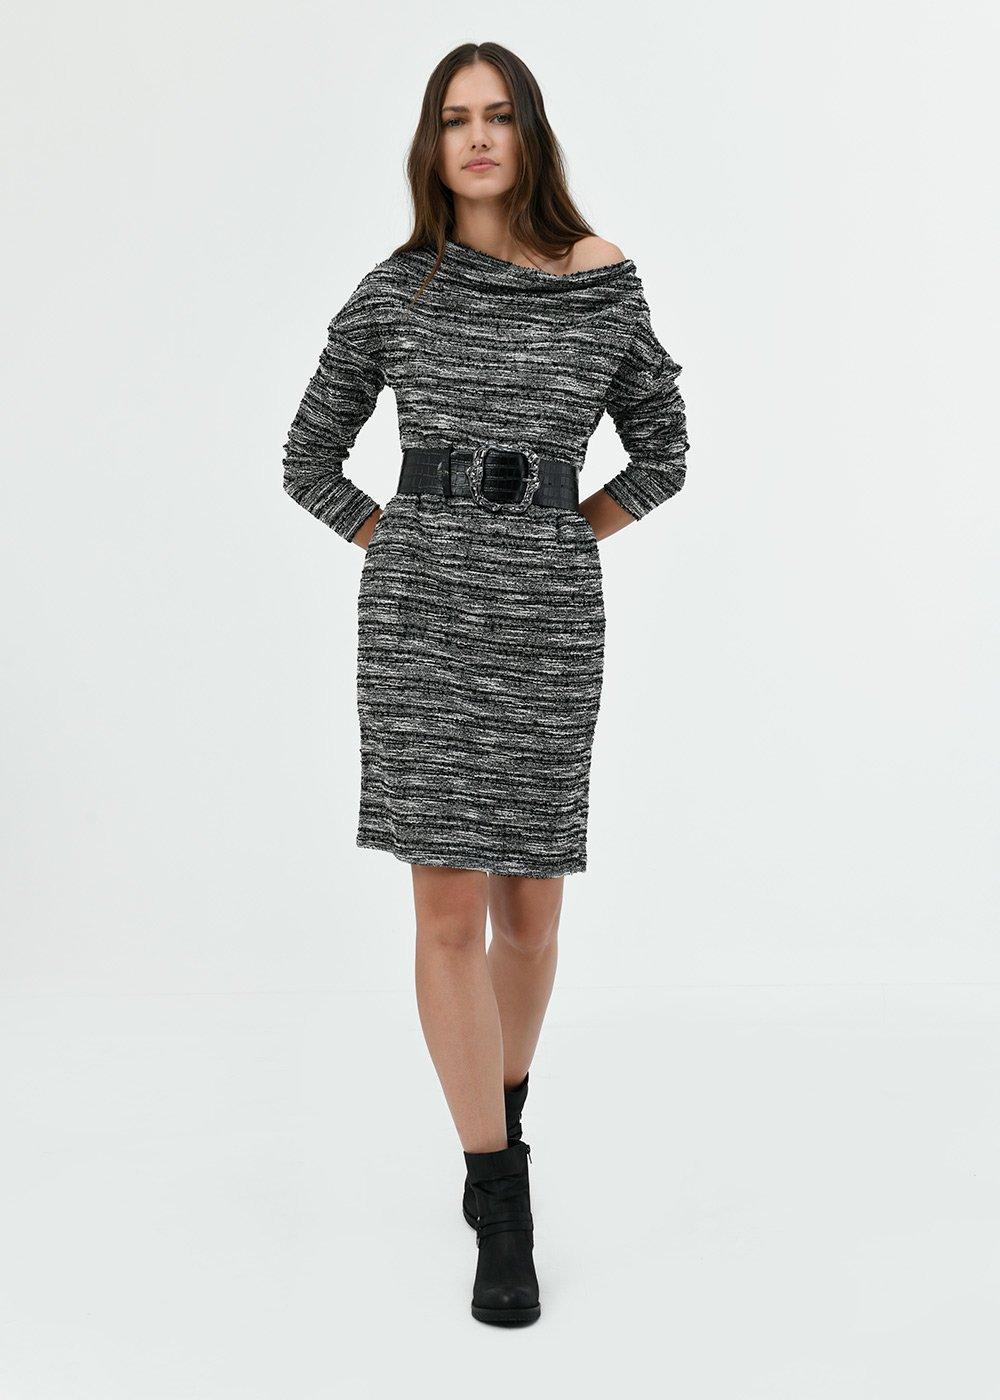 Andres jacquard dress with waist belt - Black / White / Multi - Woman